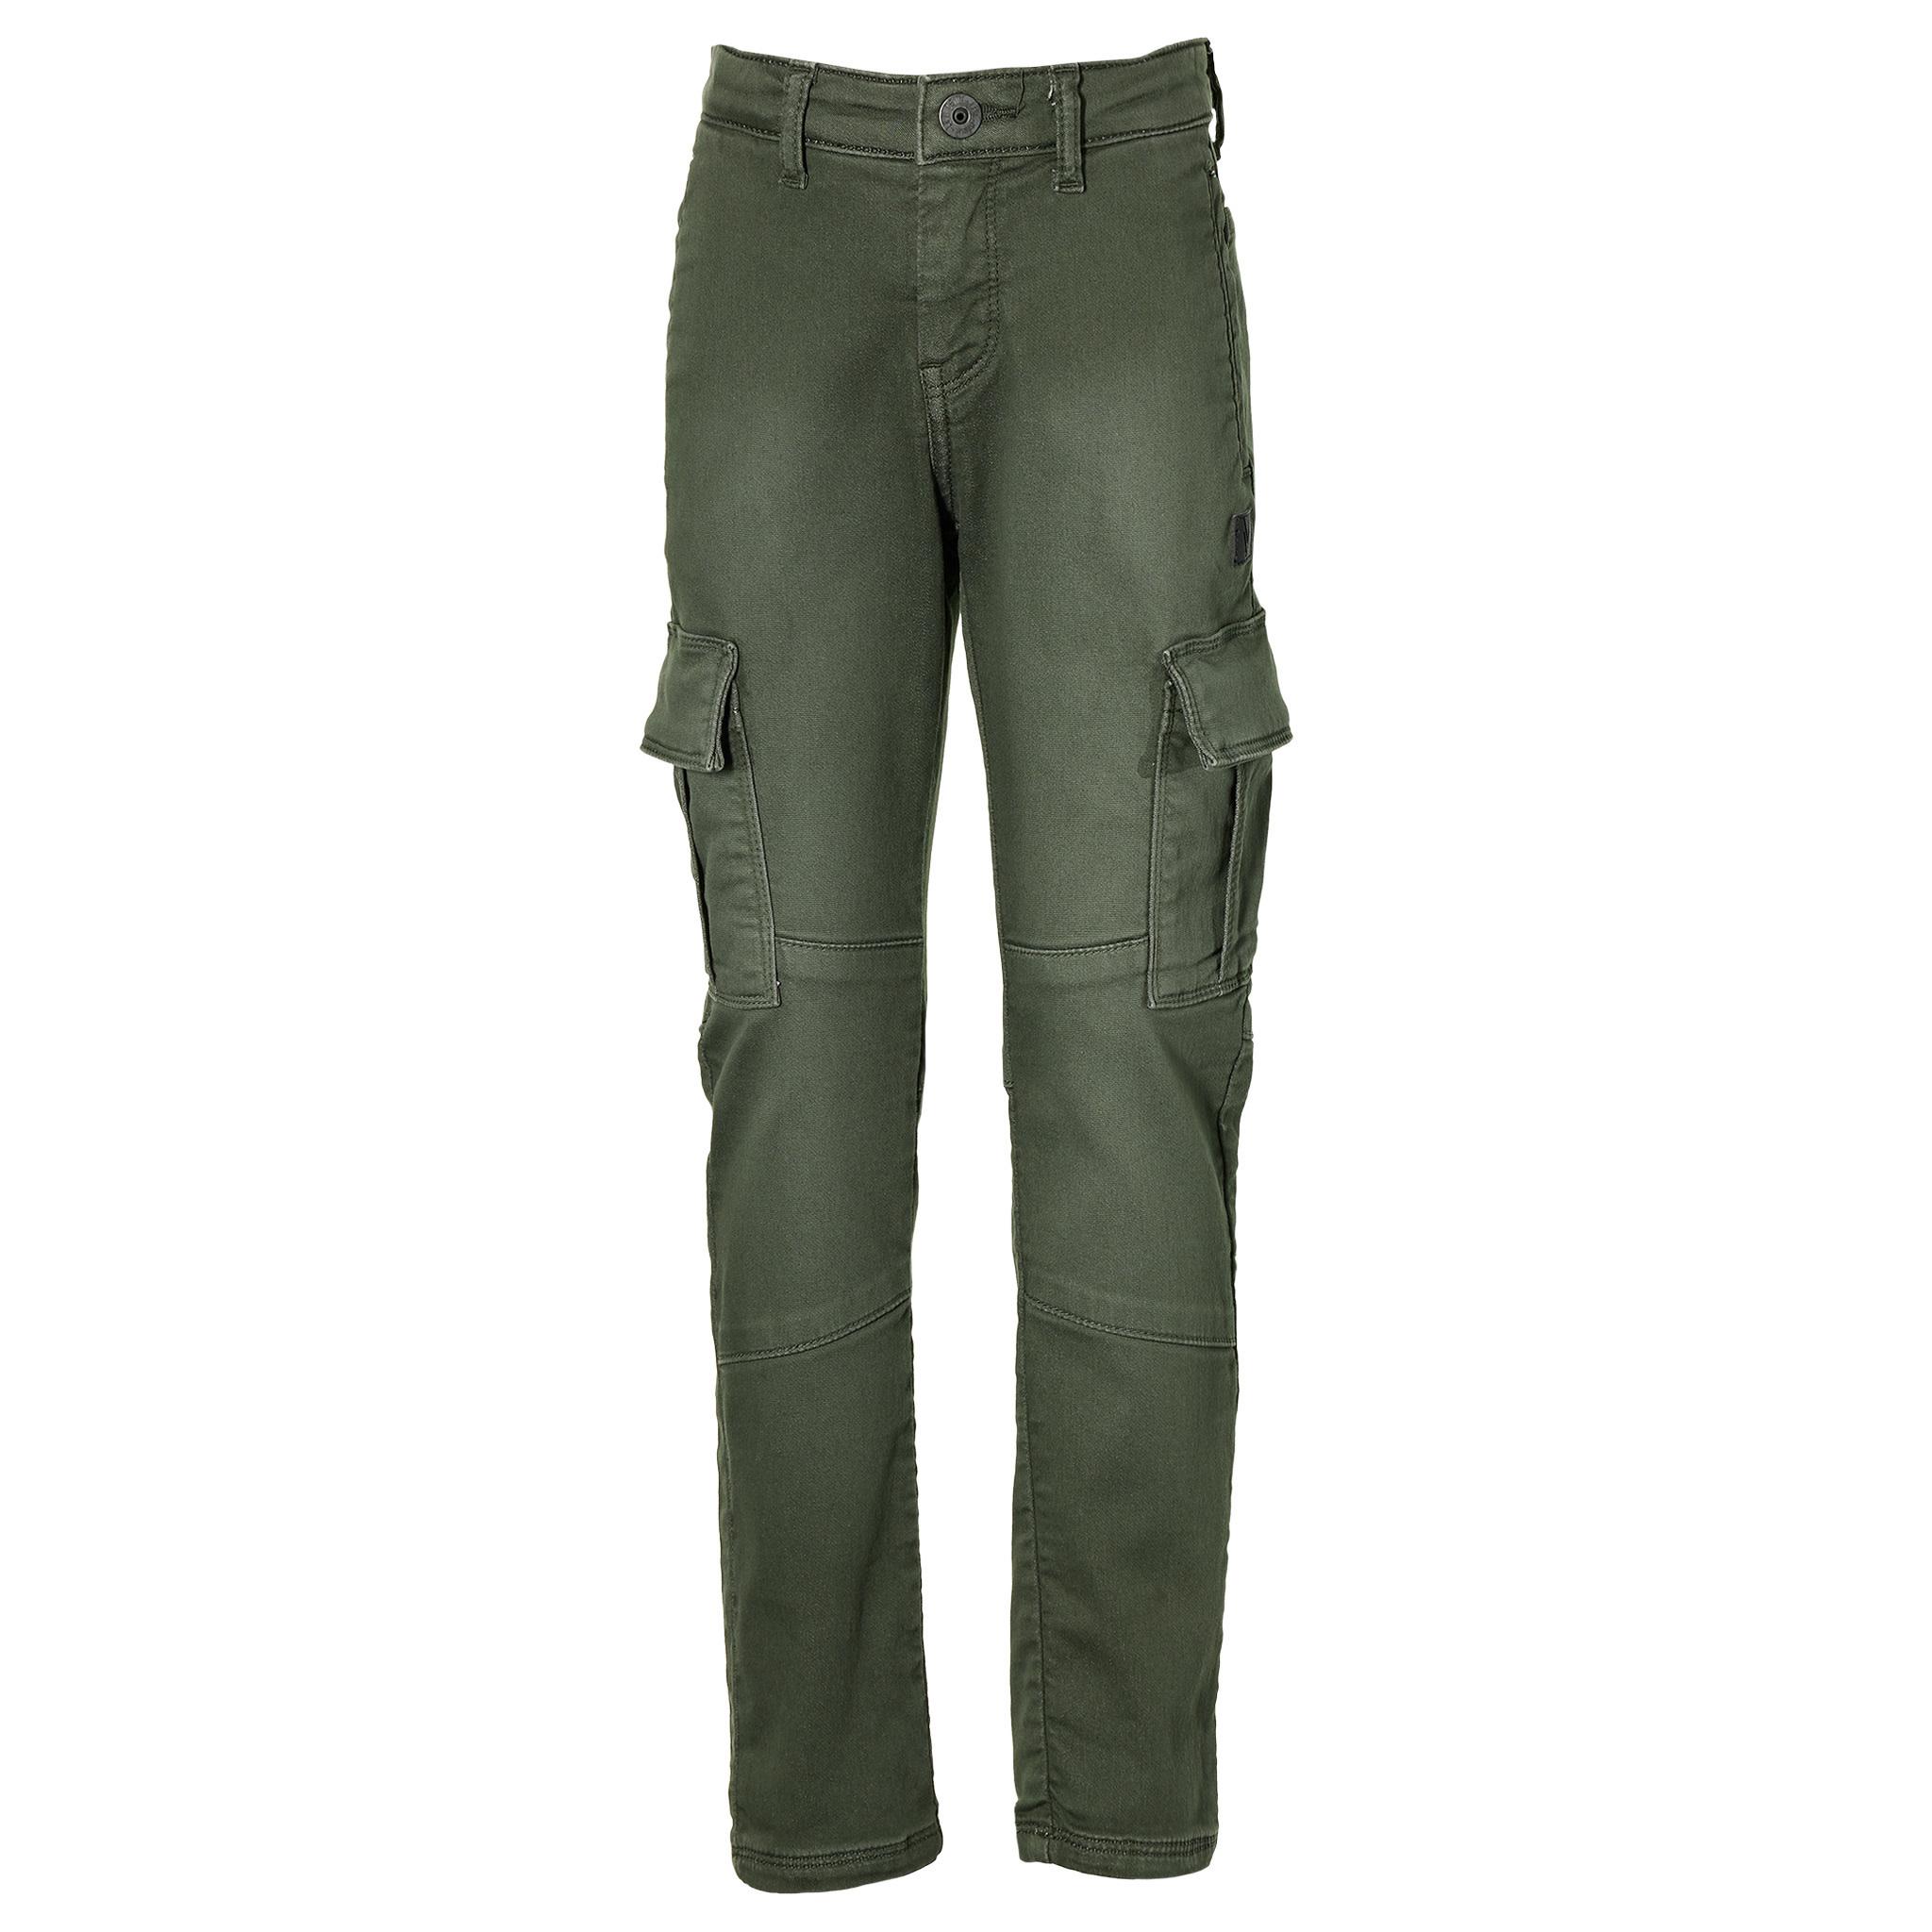 Kick Cargo Pants